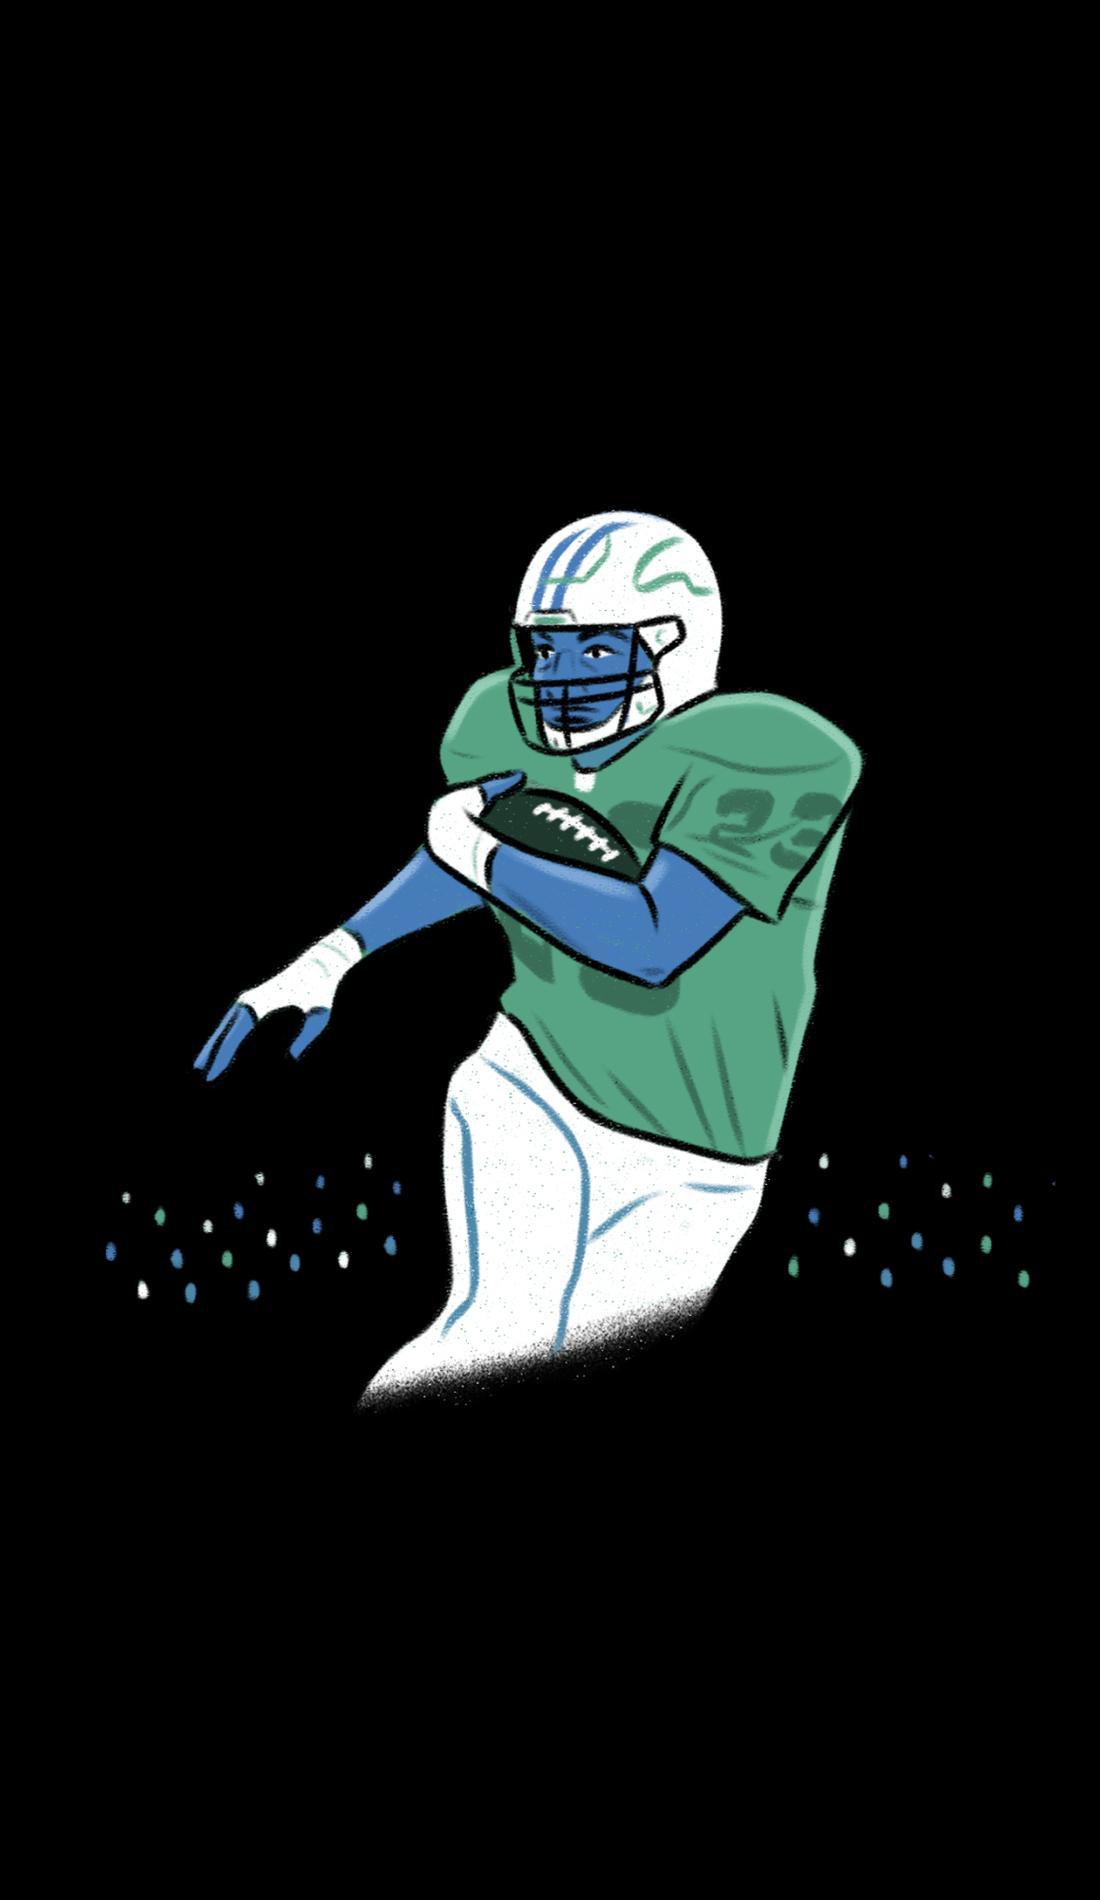 A Alabama State Hornets Football live event